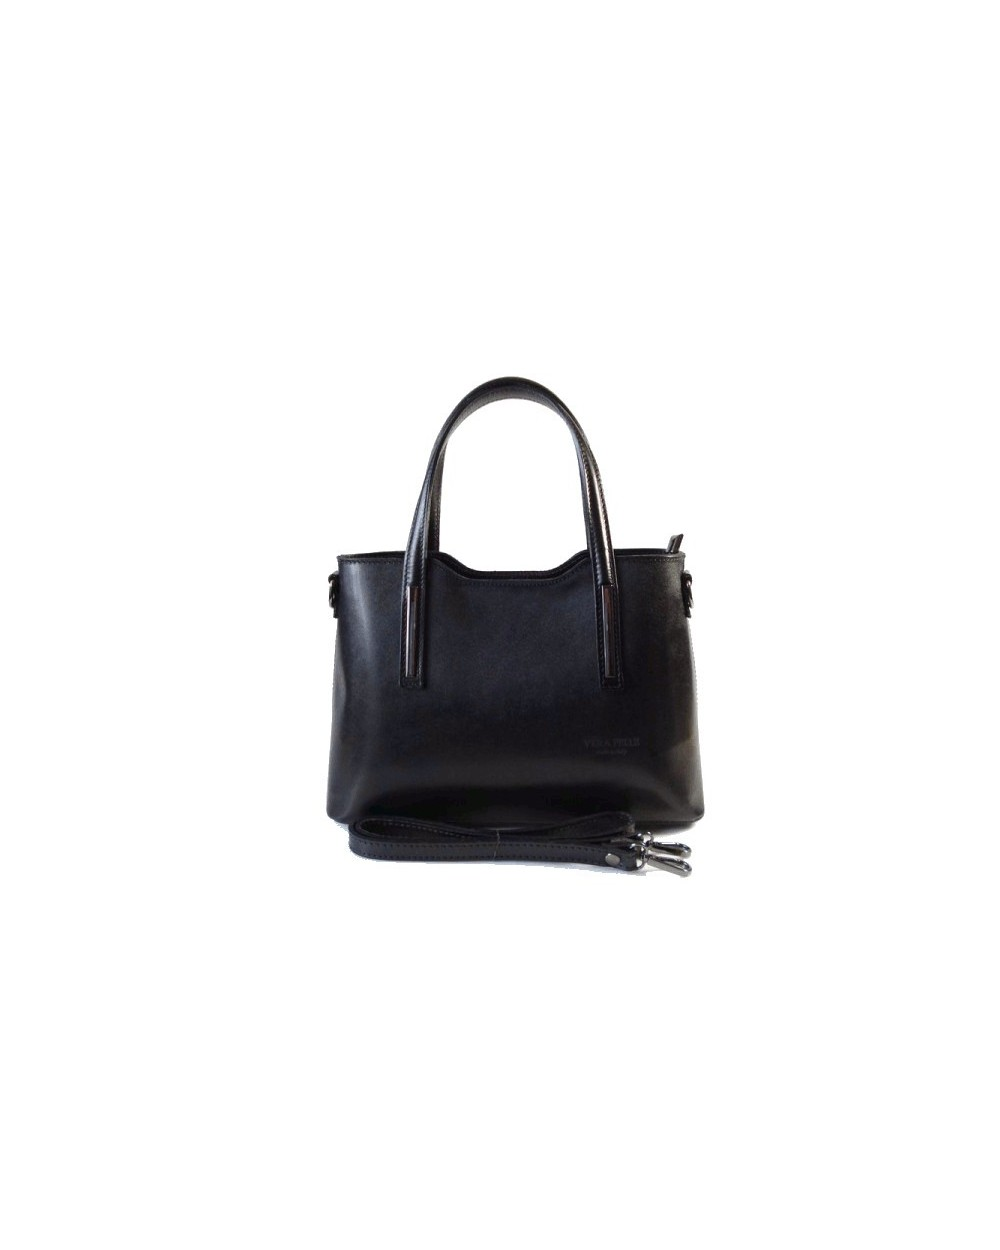 eac938d28cf8f Klasyczna elegancka włoska torebka skórzana vera pelle Czarna. ‹ ›